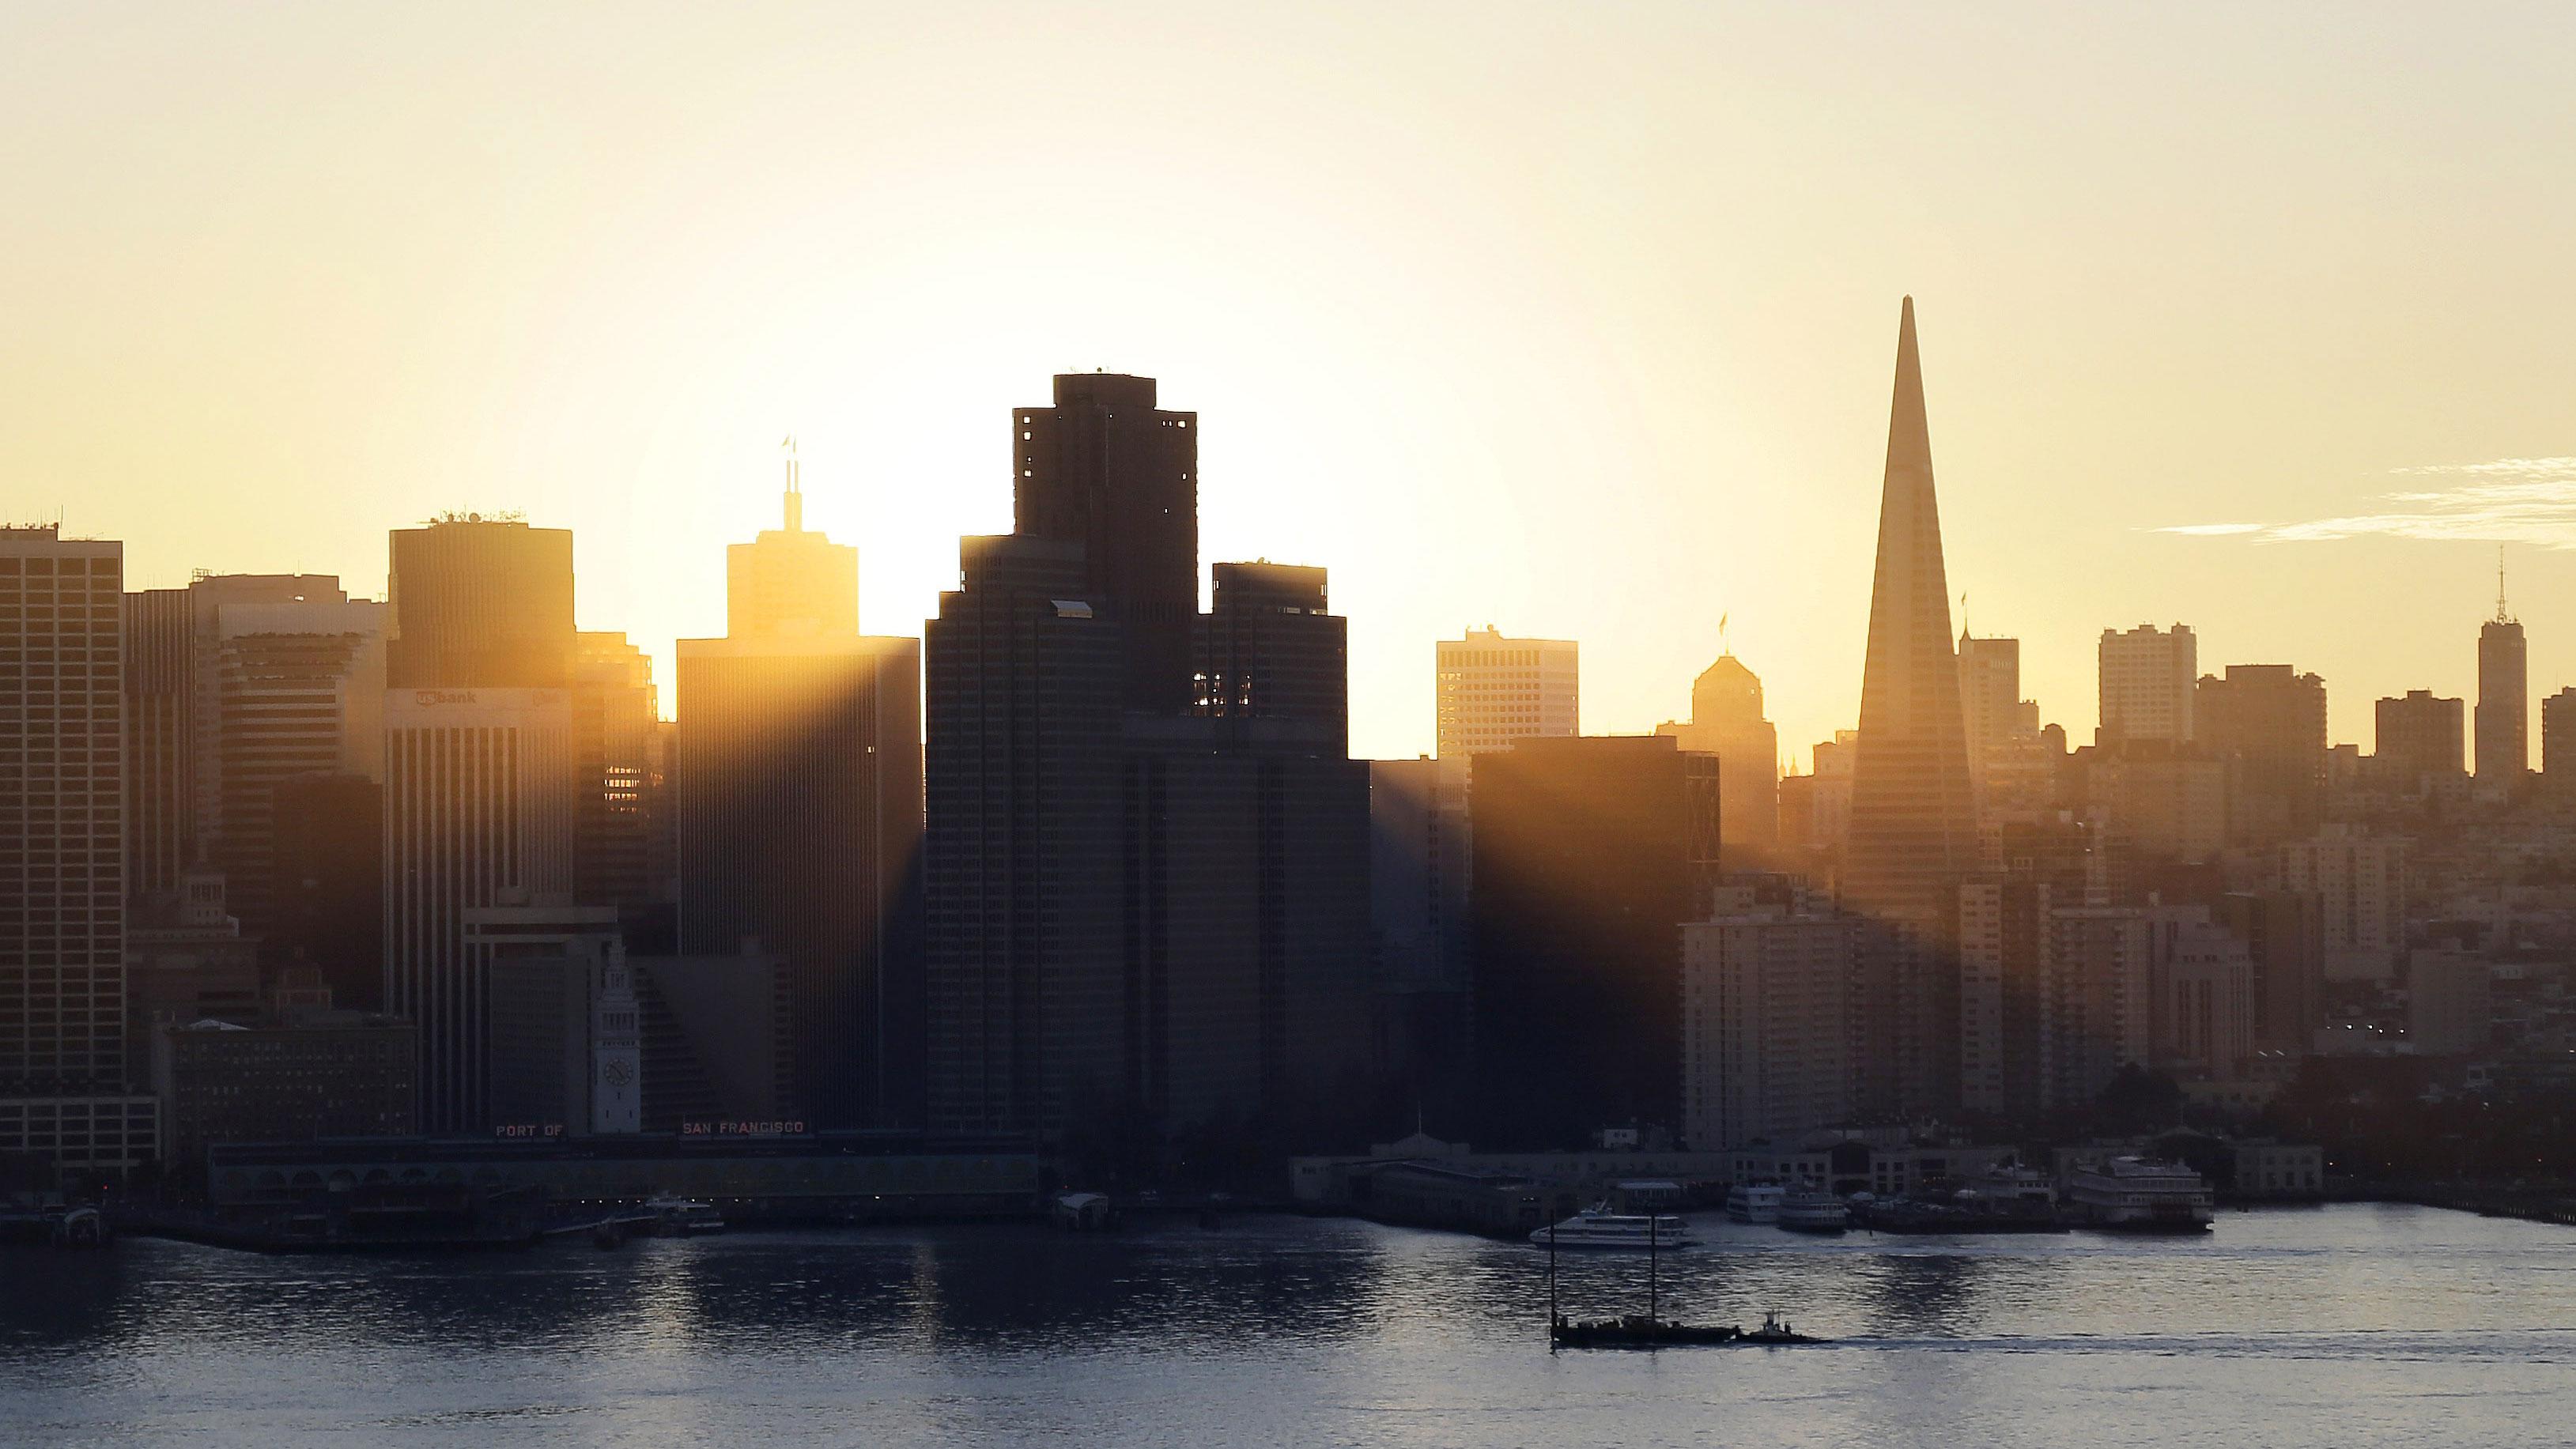 The sun sets behind the city skyline on Wednesday, Jan. 7, 2015, in San Francisco. (AP Photo/Marcio Jose Sanchez)